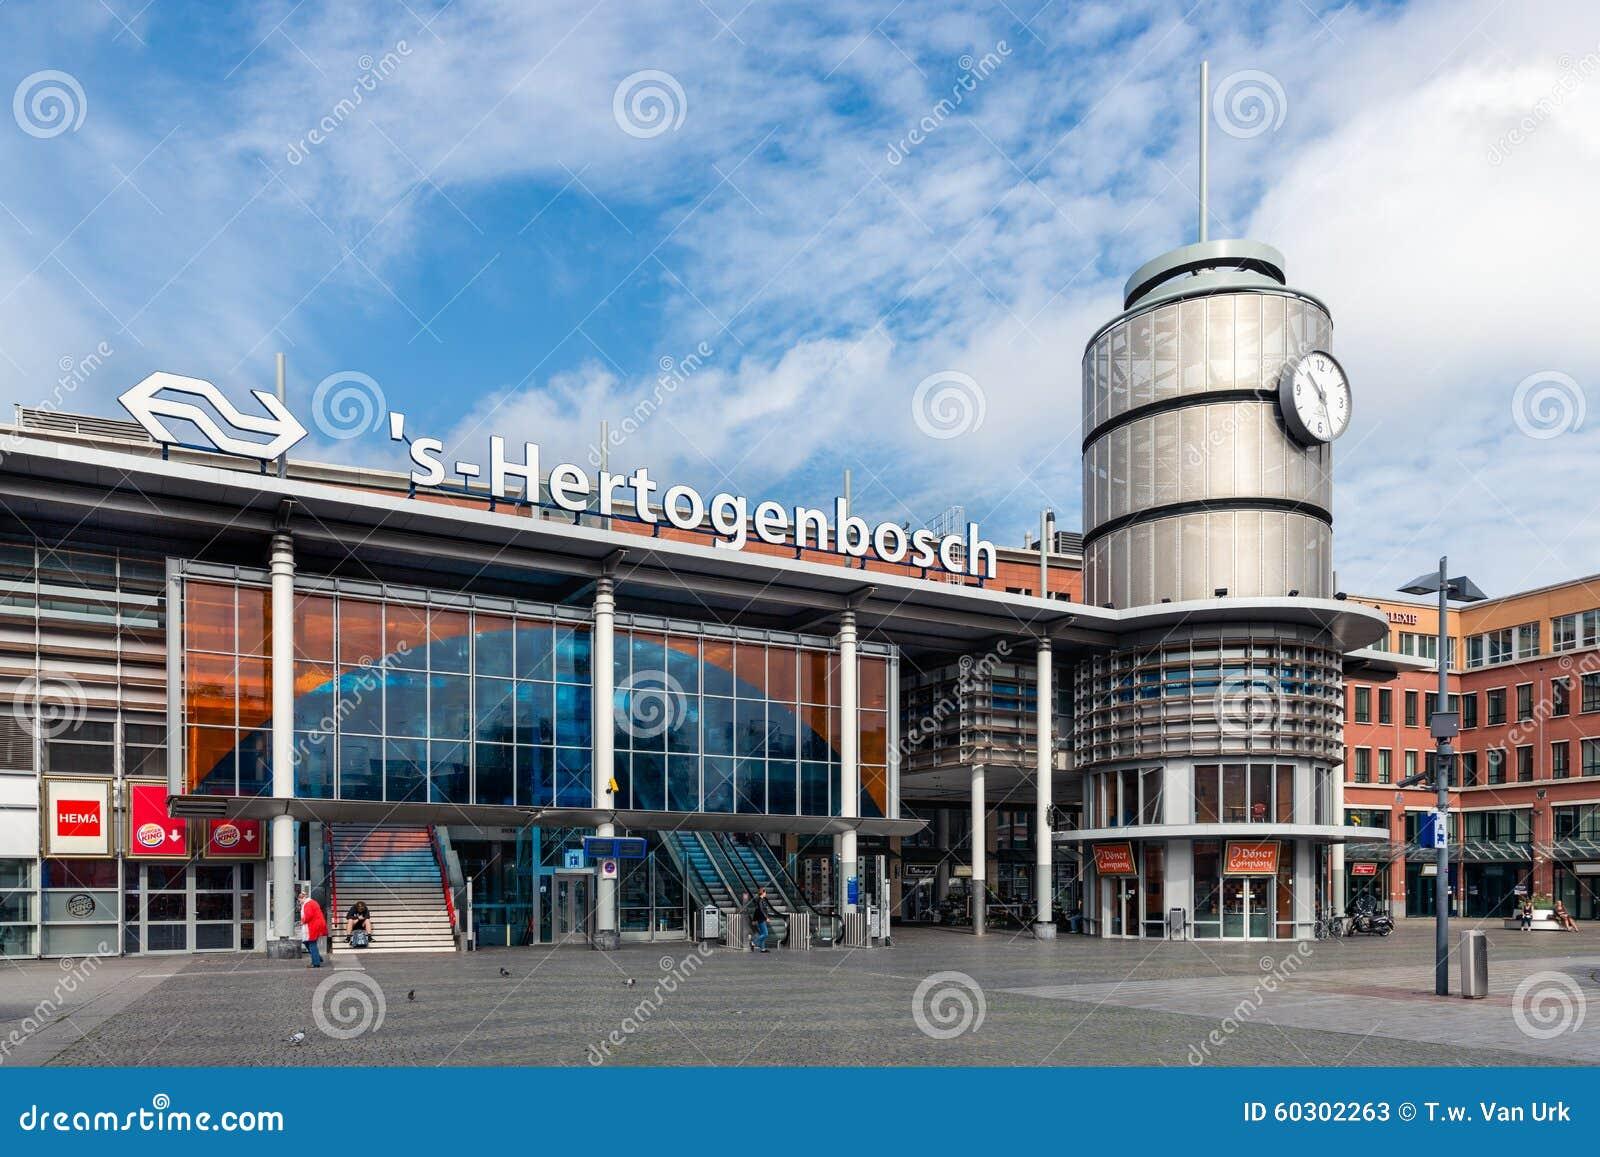 Mensen voor Nederlands station Den Bosch, Nederland